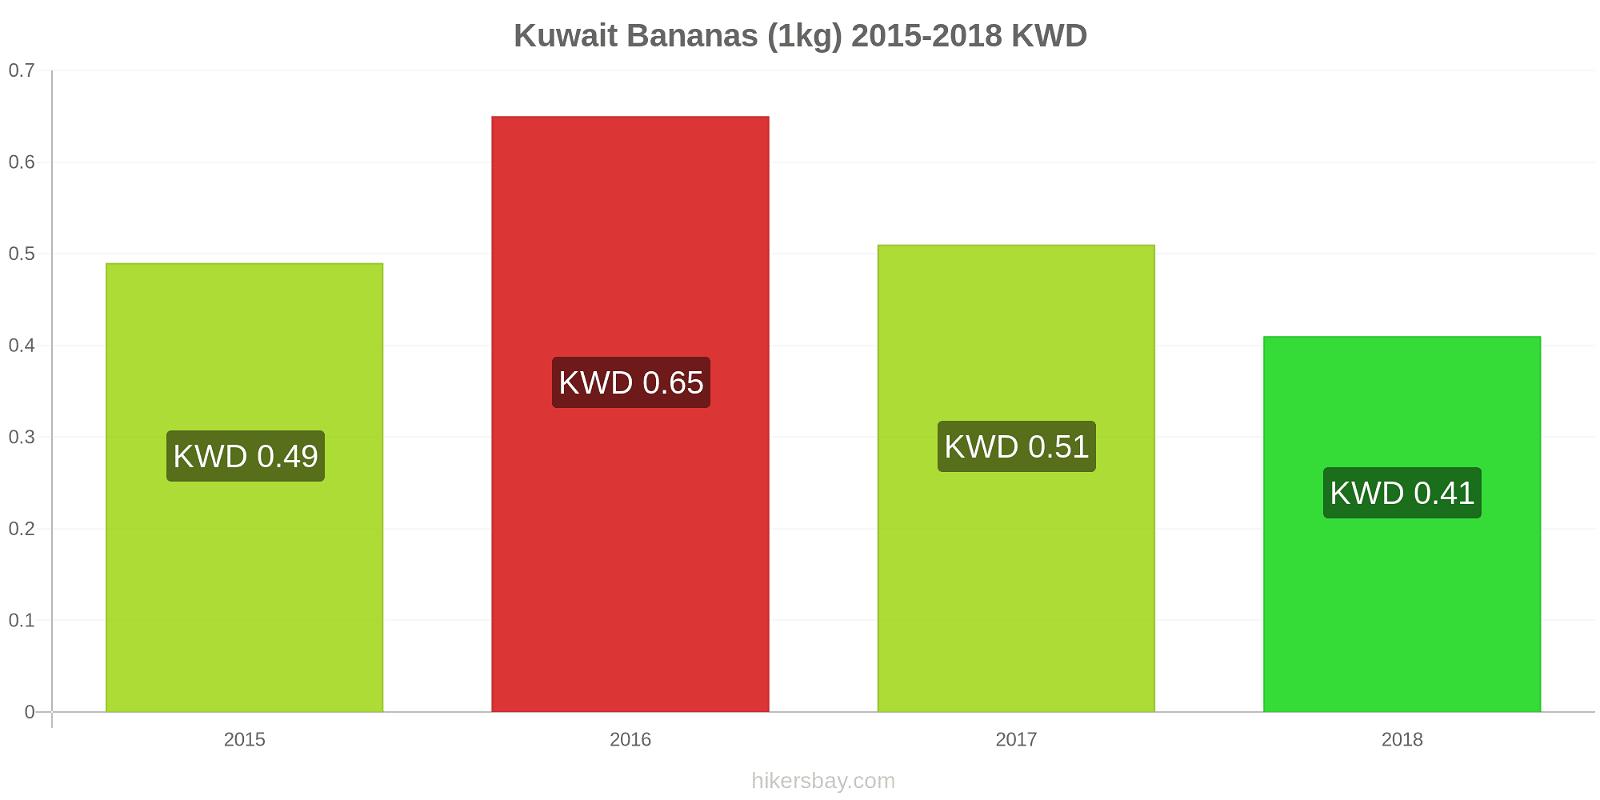 Kuwait price changes Bananas (1kg) hikersbay.com